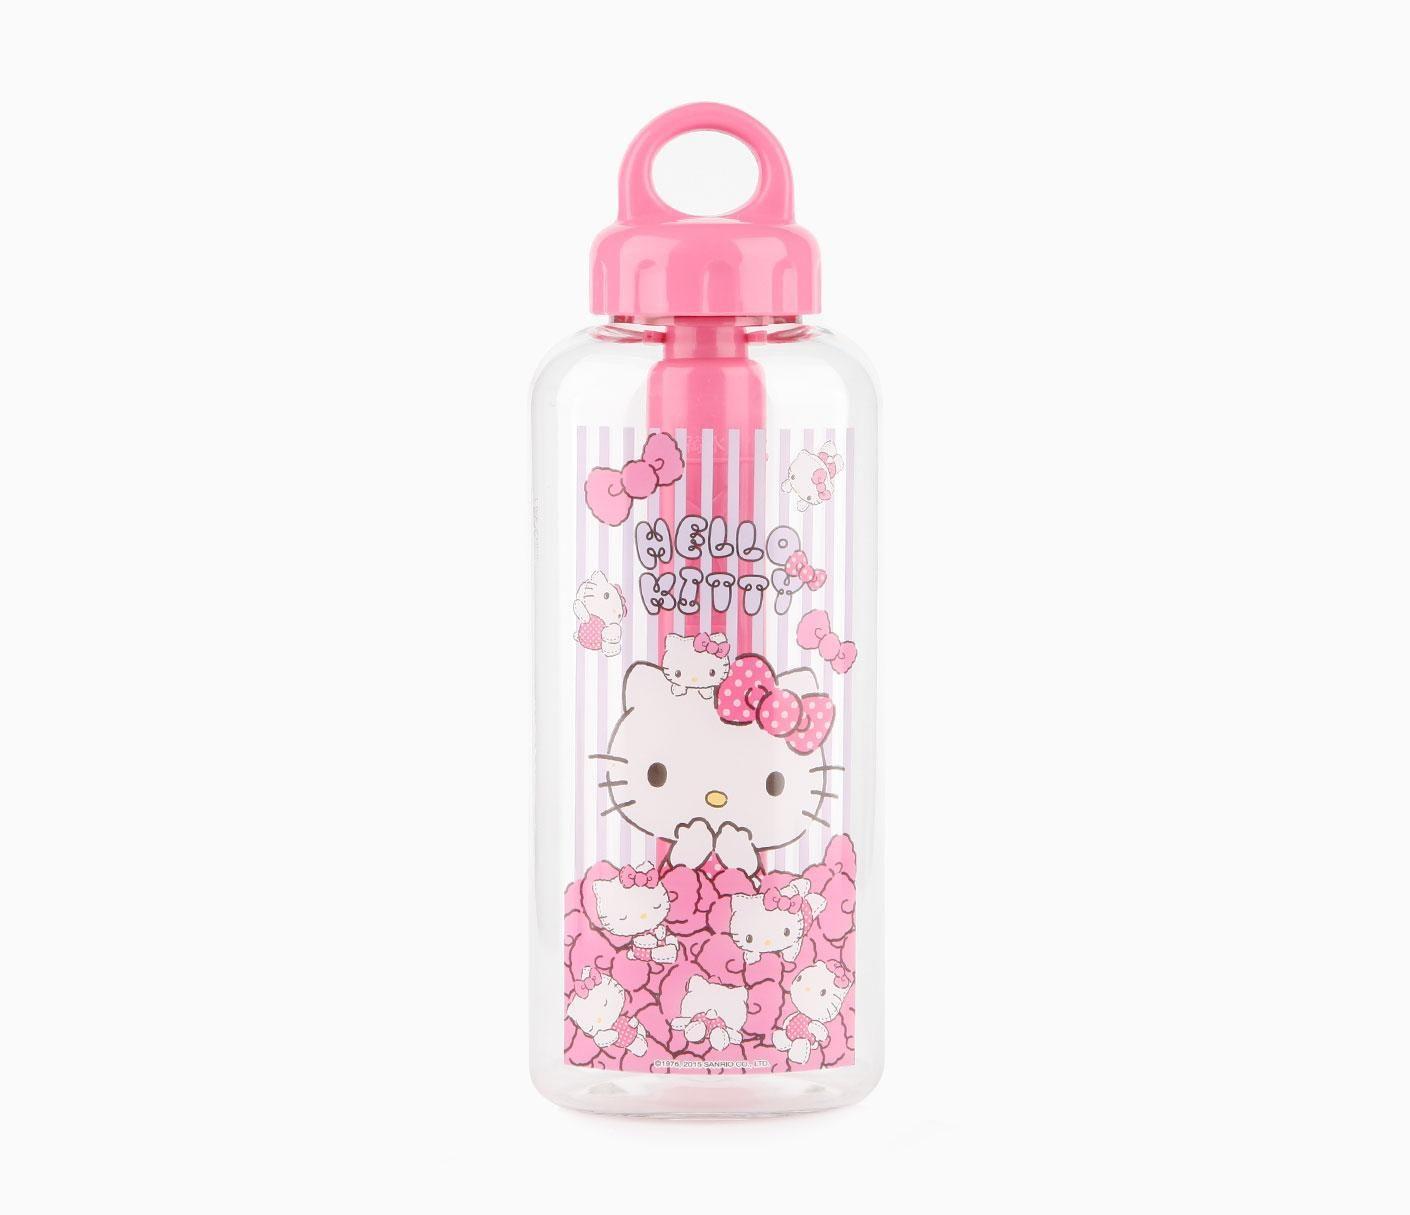 Hello Kitty Water Bottle with Ice Tube: Doll | Hello Kitty ...